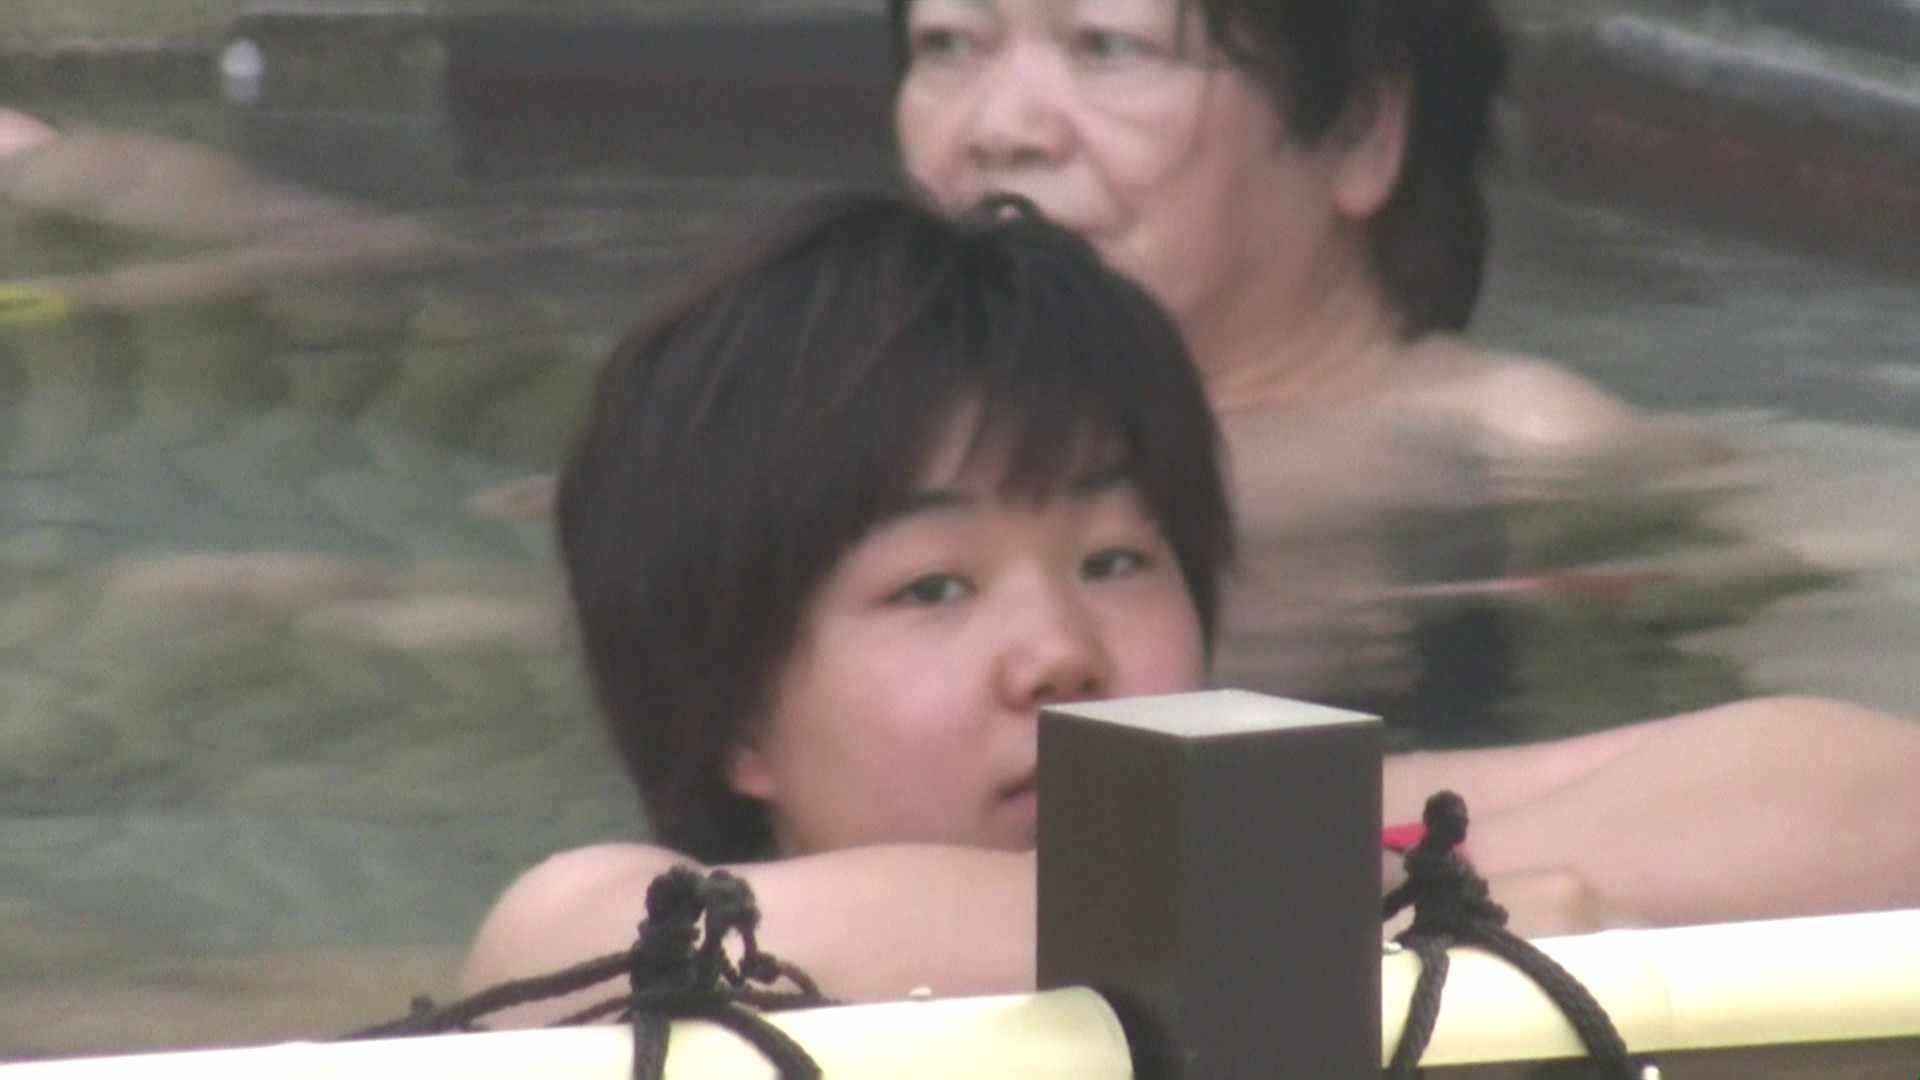 Aquaな露天風呂Vol.53【VIP限定】 女体盗撮  93連発 27